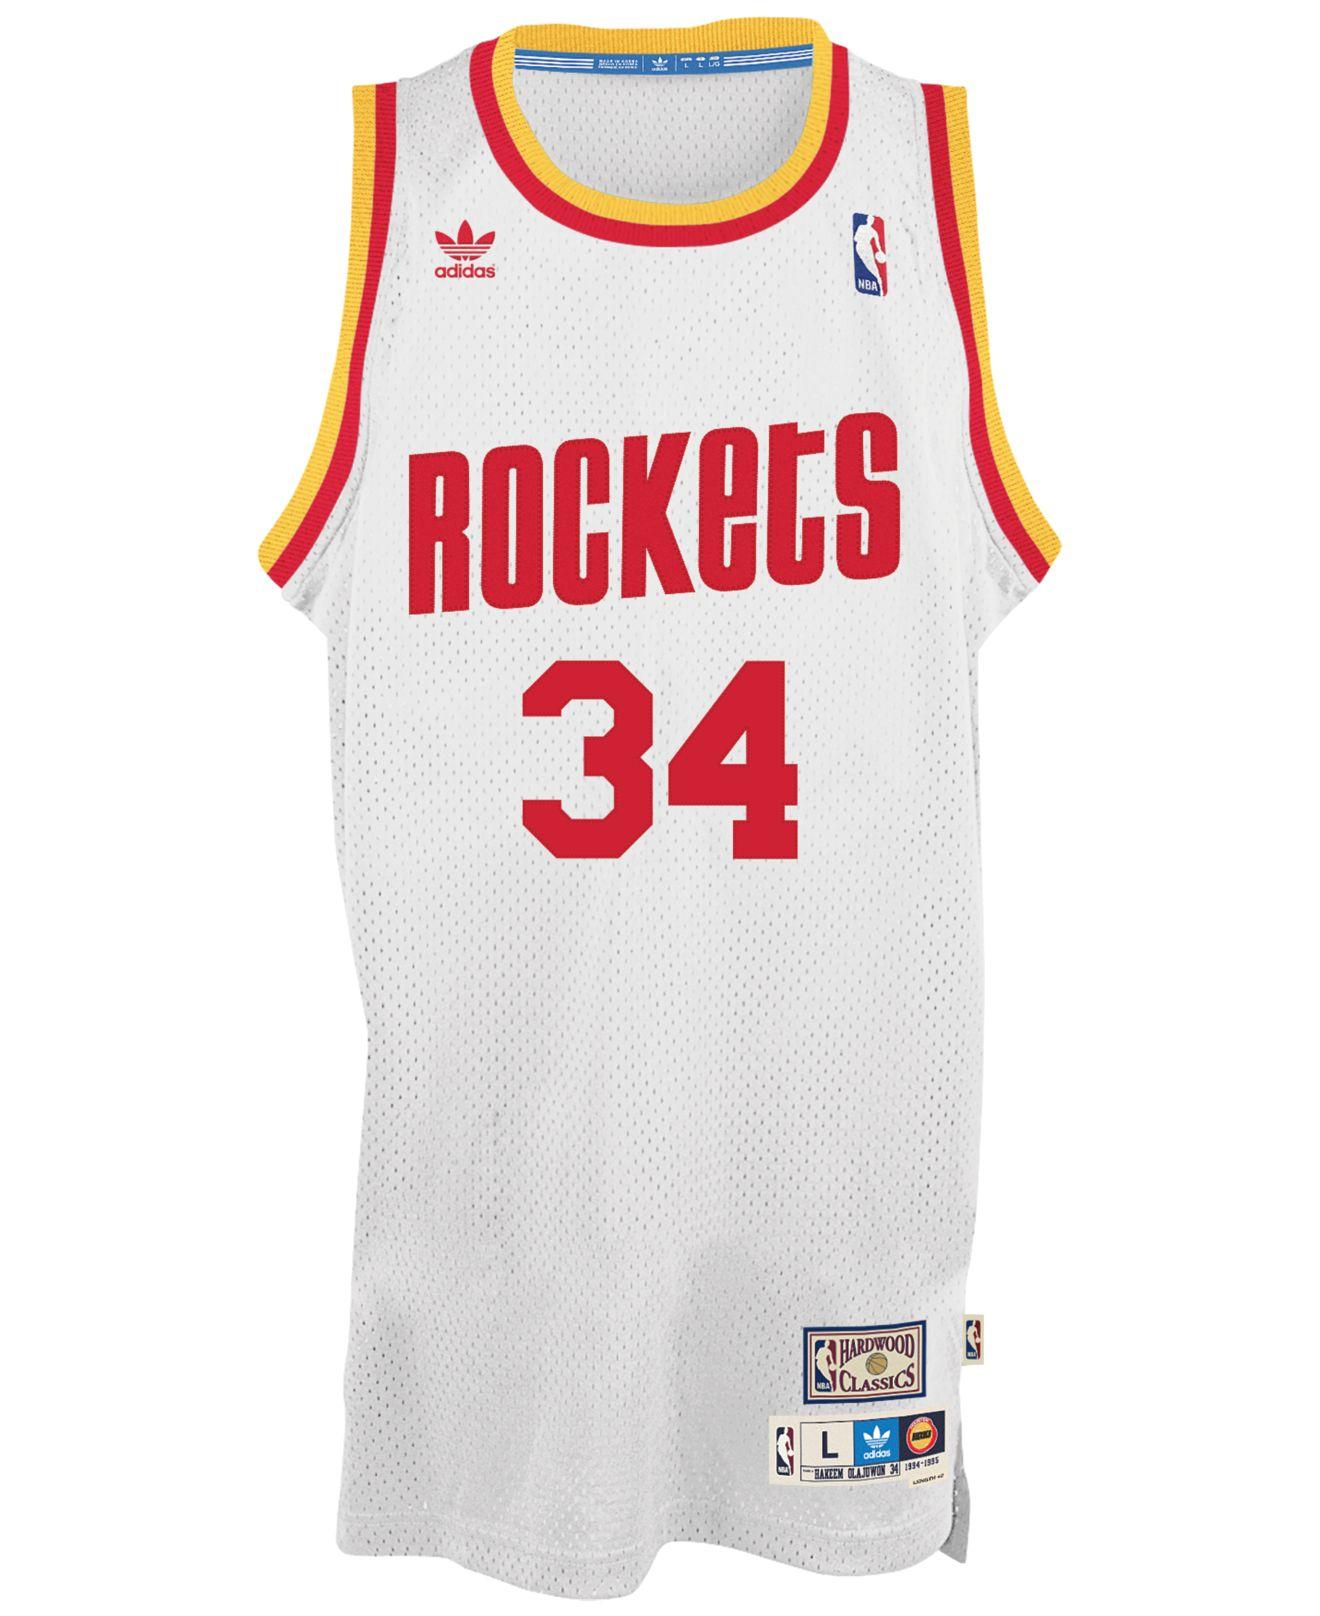 low priced 2f097 20041 Adidas White Men'S Hakeem Olajuwon Houston Rockets Retired Player Swingman  Jersey for men